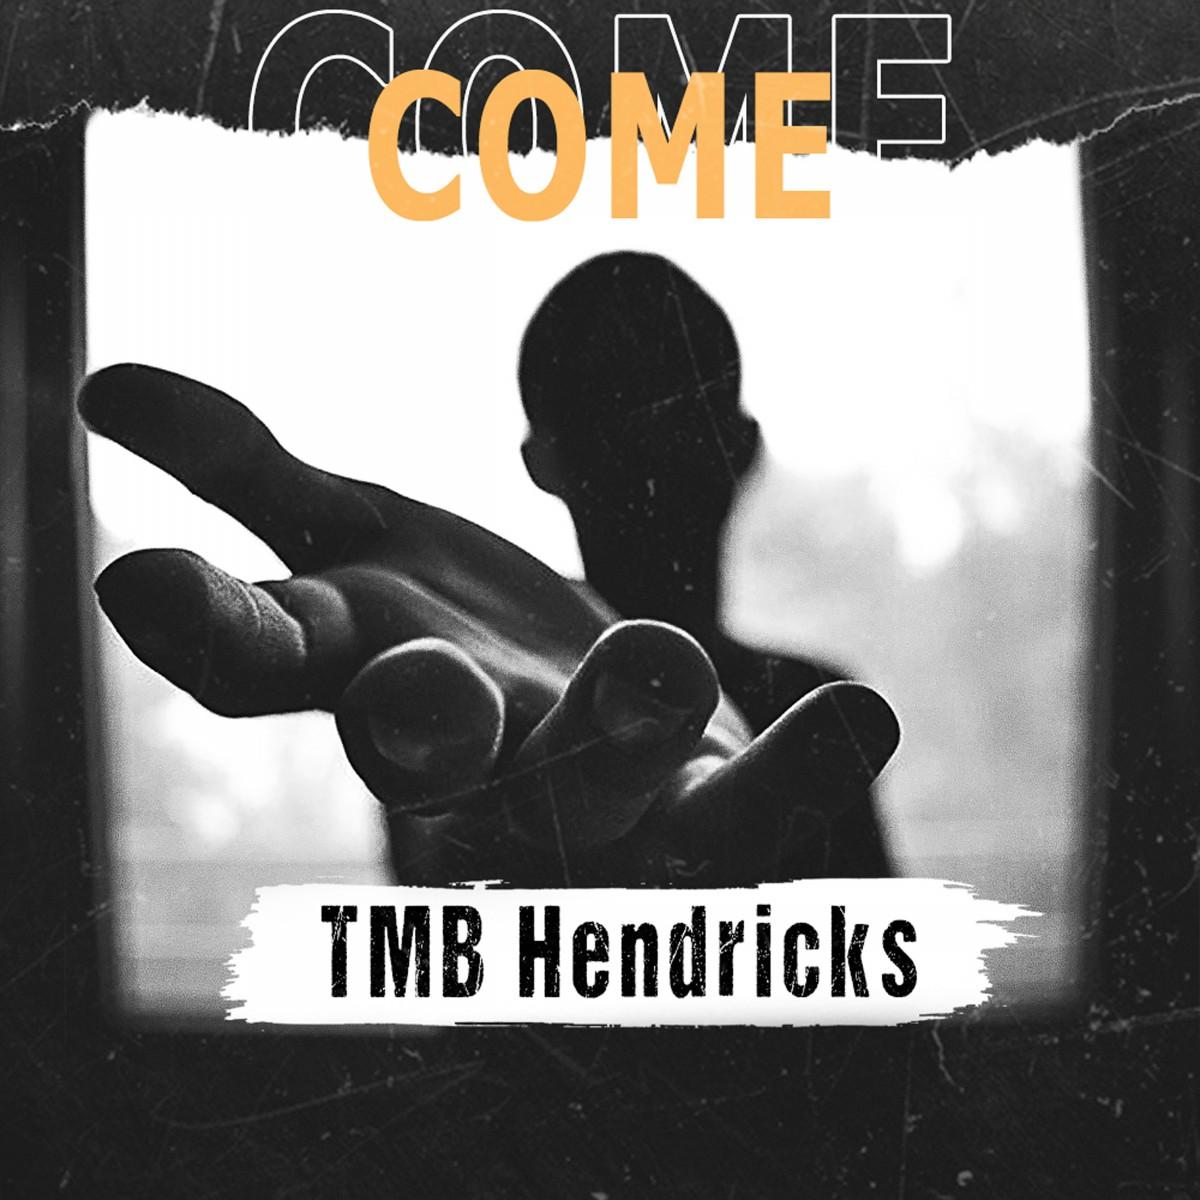 TMB Hendricks - Come